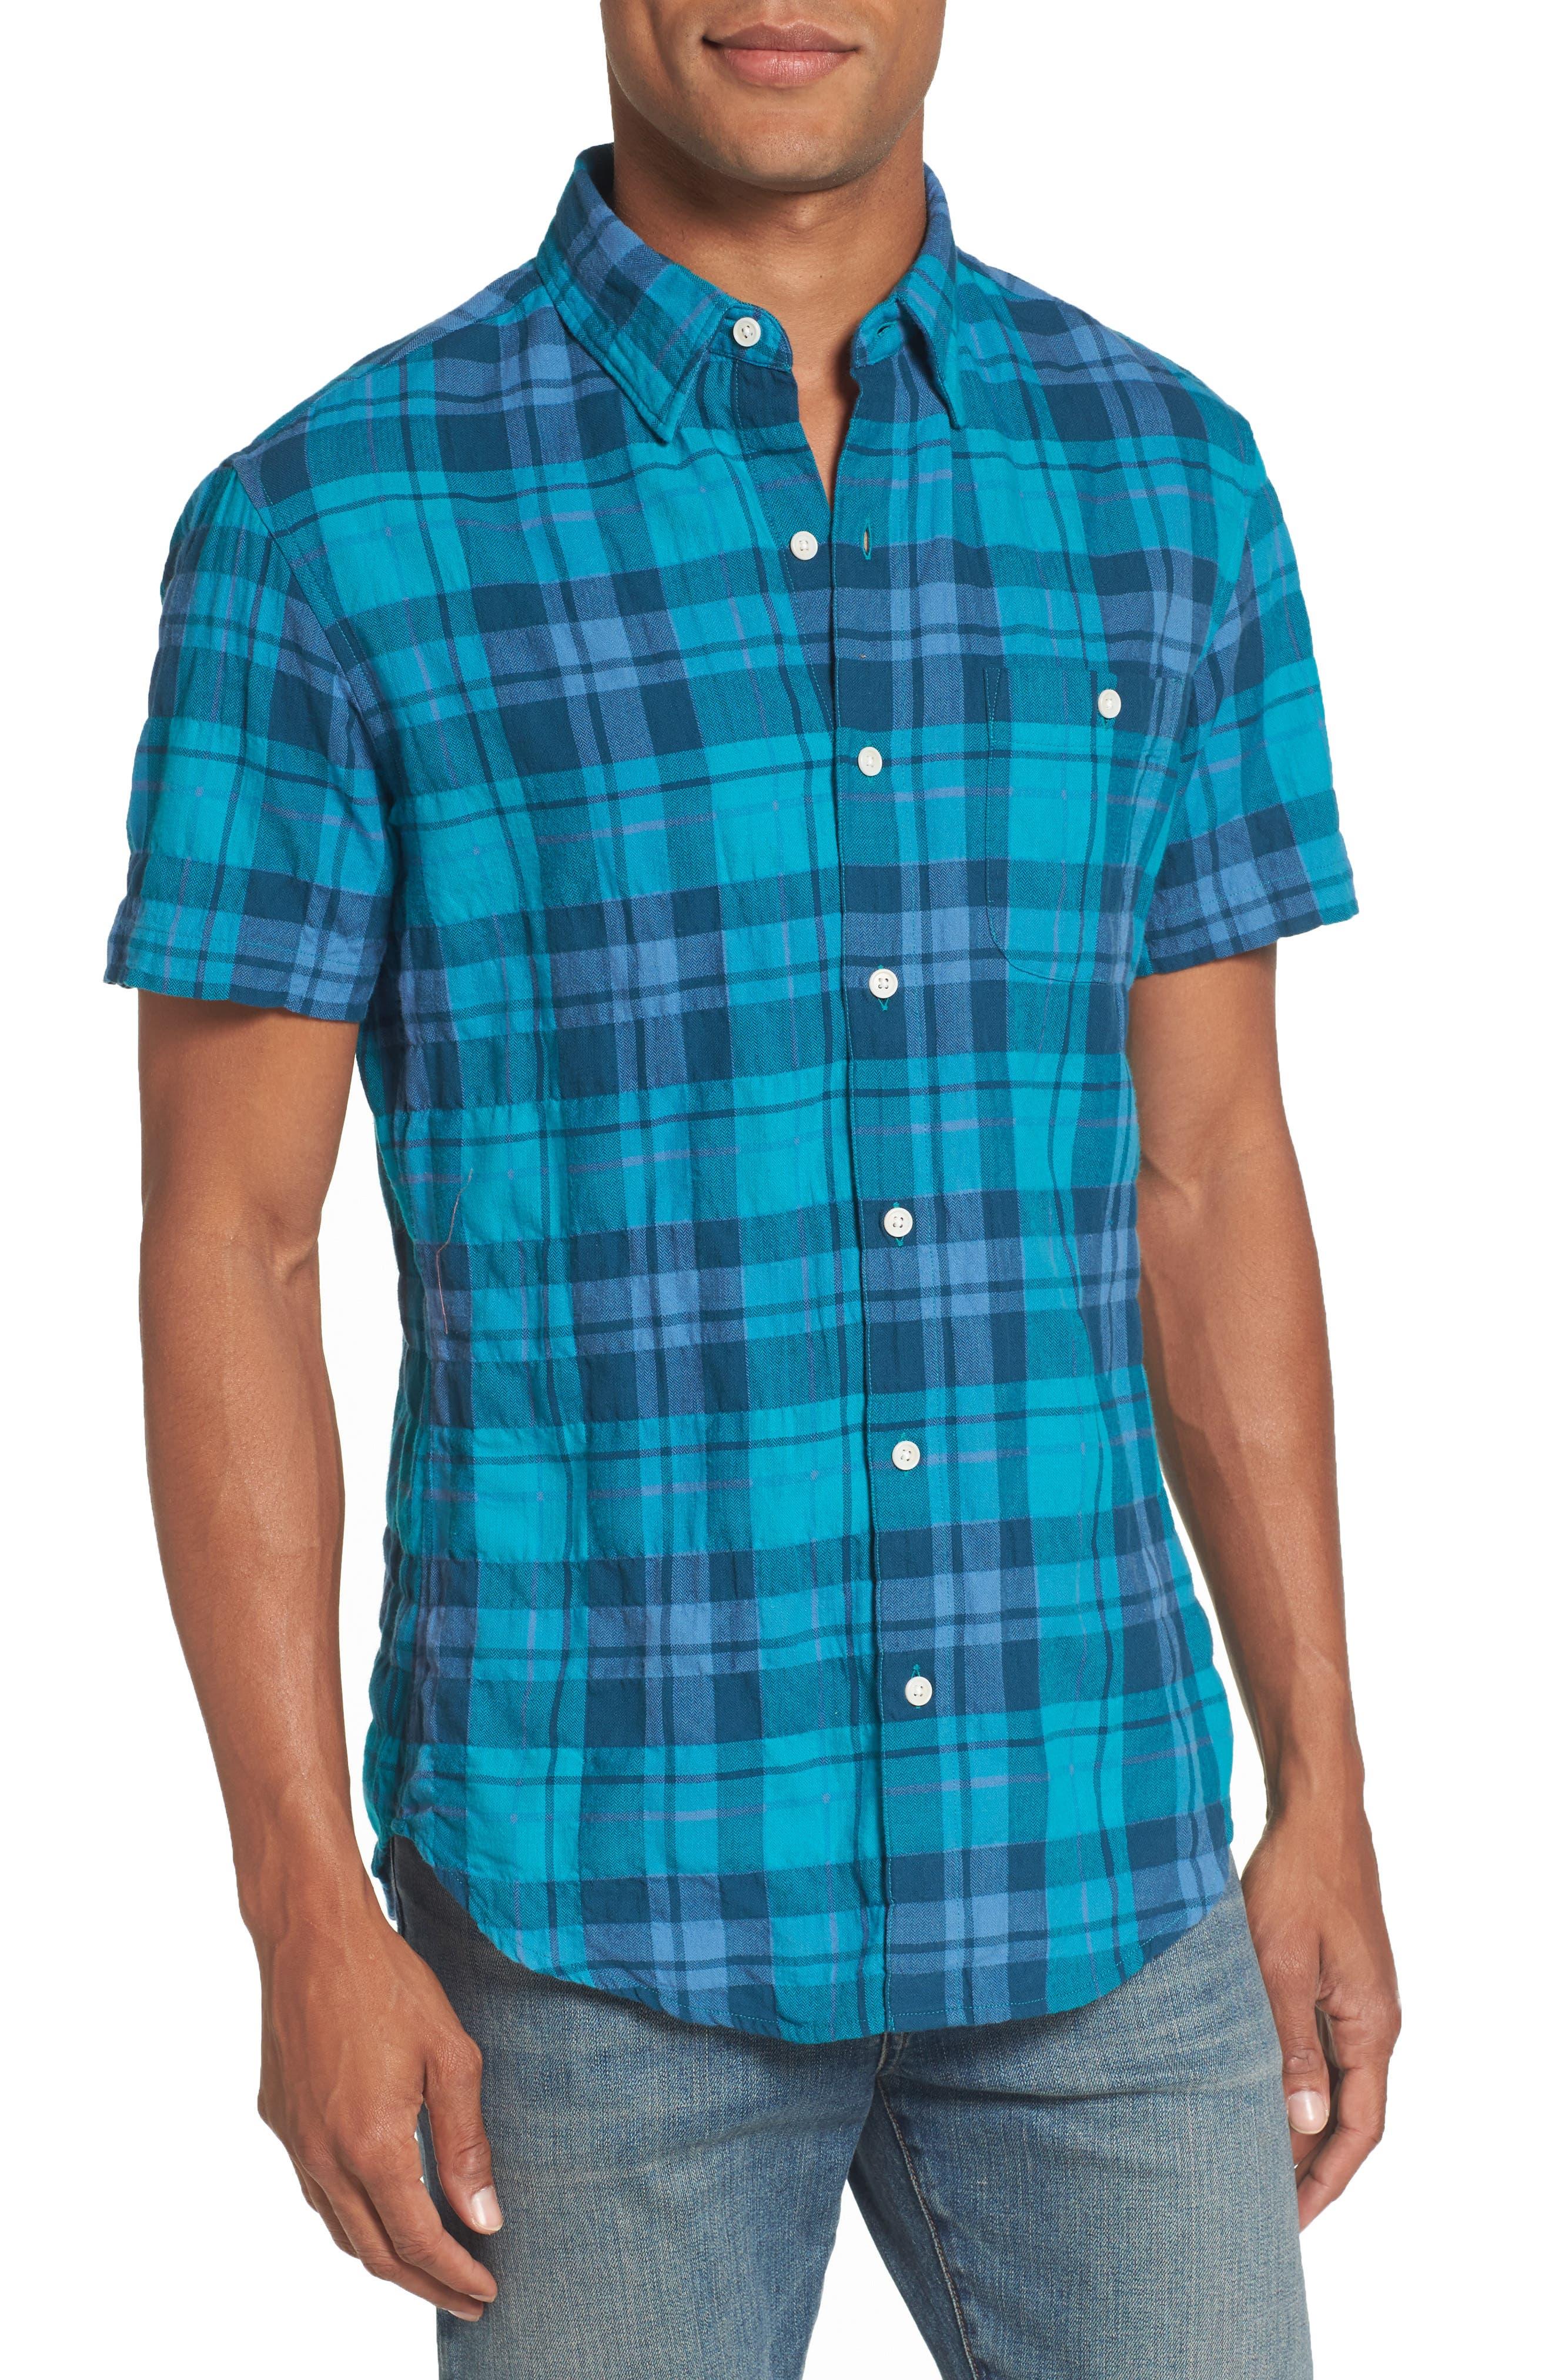 Main Image - Bonobos Riveria Slim Fit Check Woven Shirt